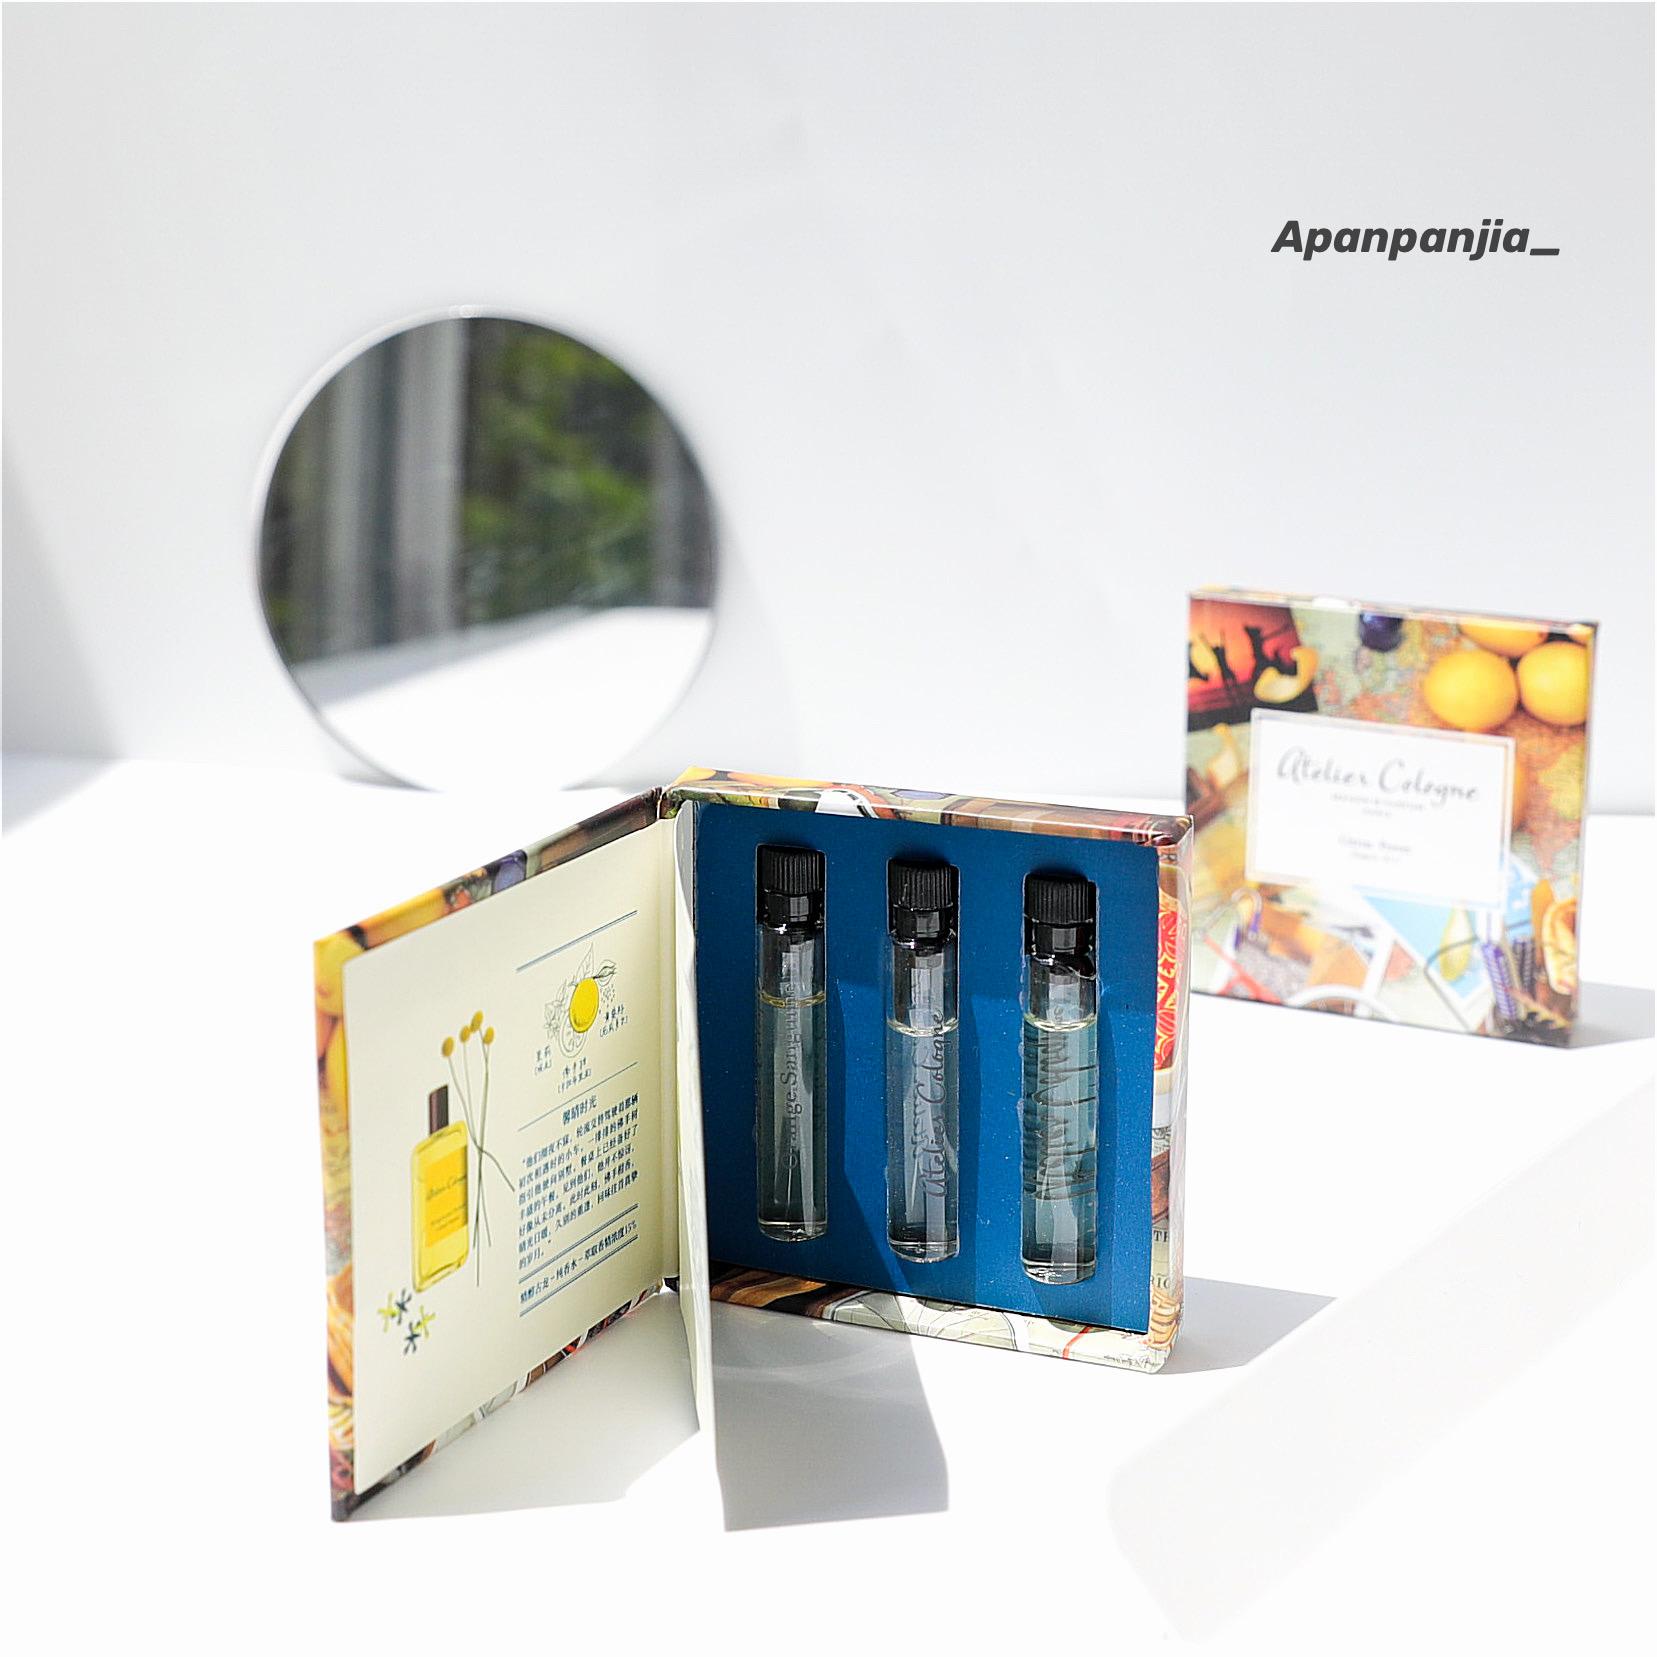 Atelier Cologne欧珑香水礼盒2ml*3 赤霞橘光 醉心柠香 馨晴时光